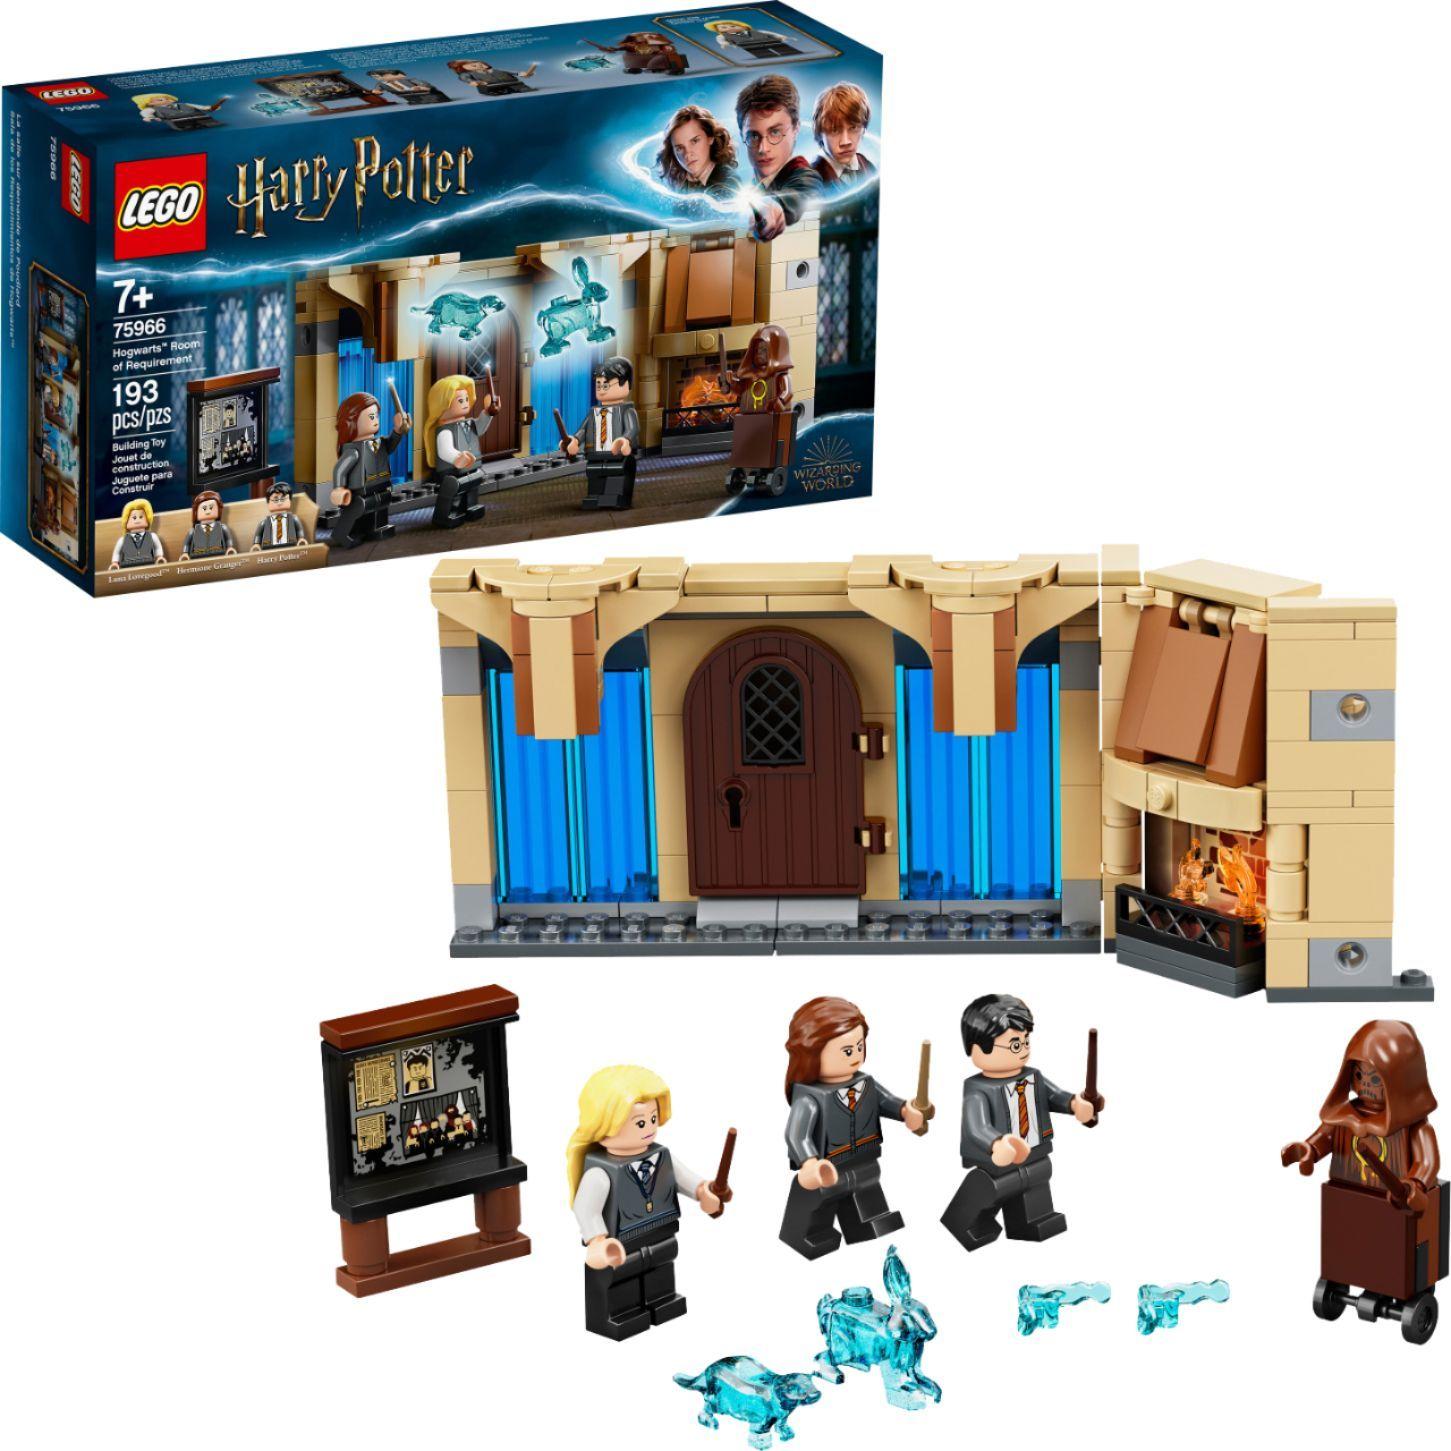 Lego Harry Potter Hogwarts Room Of Requirement 75966 6289044 Best Buy Lego Harry Potter Hogwarts Room Harry Potter Lego Sets